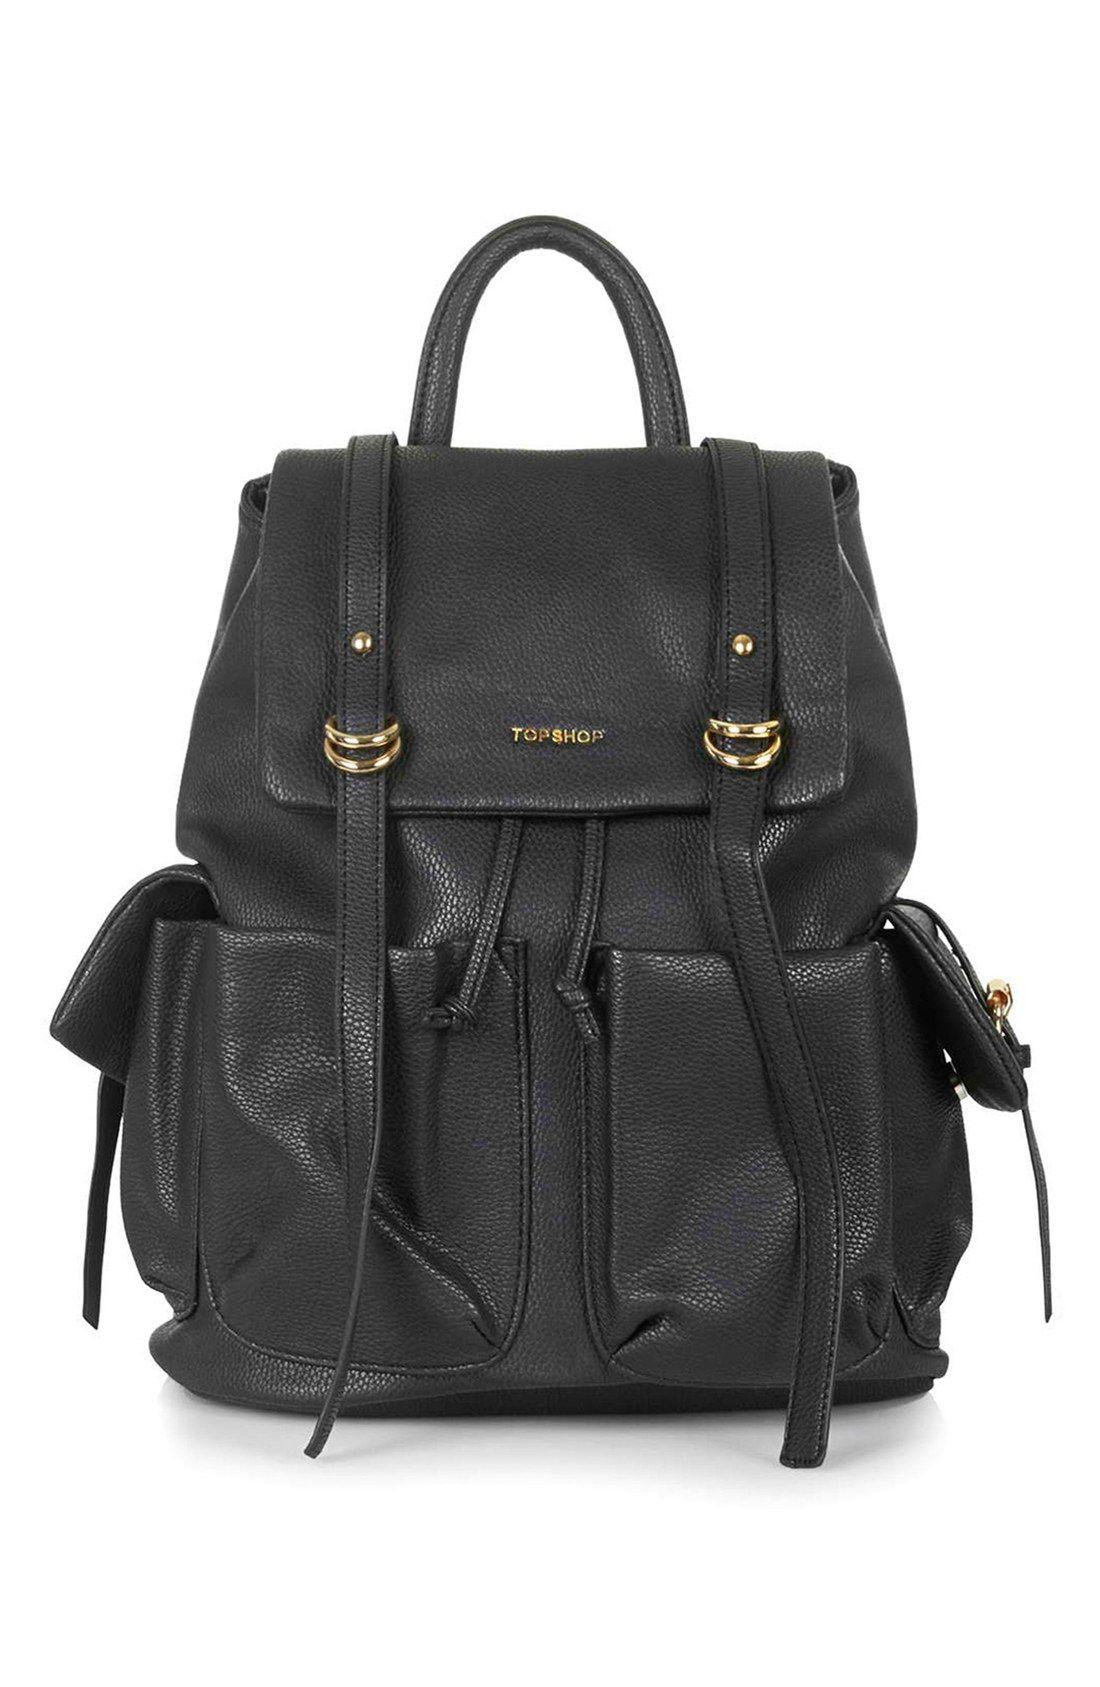 Topshop  Edinburgh  Faux Leather Backpack  73e28a466dce0